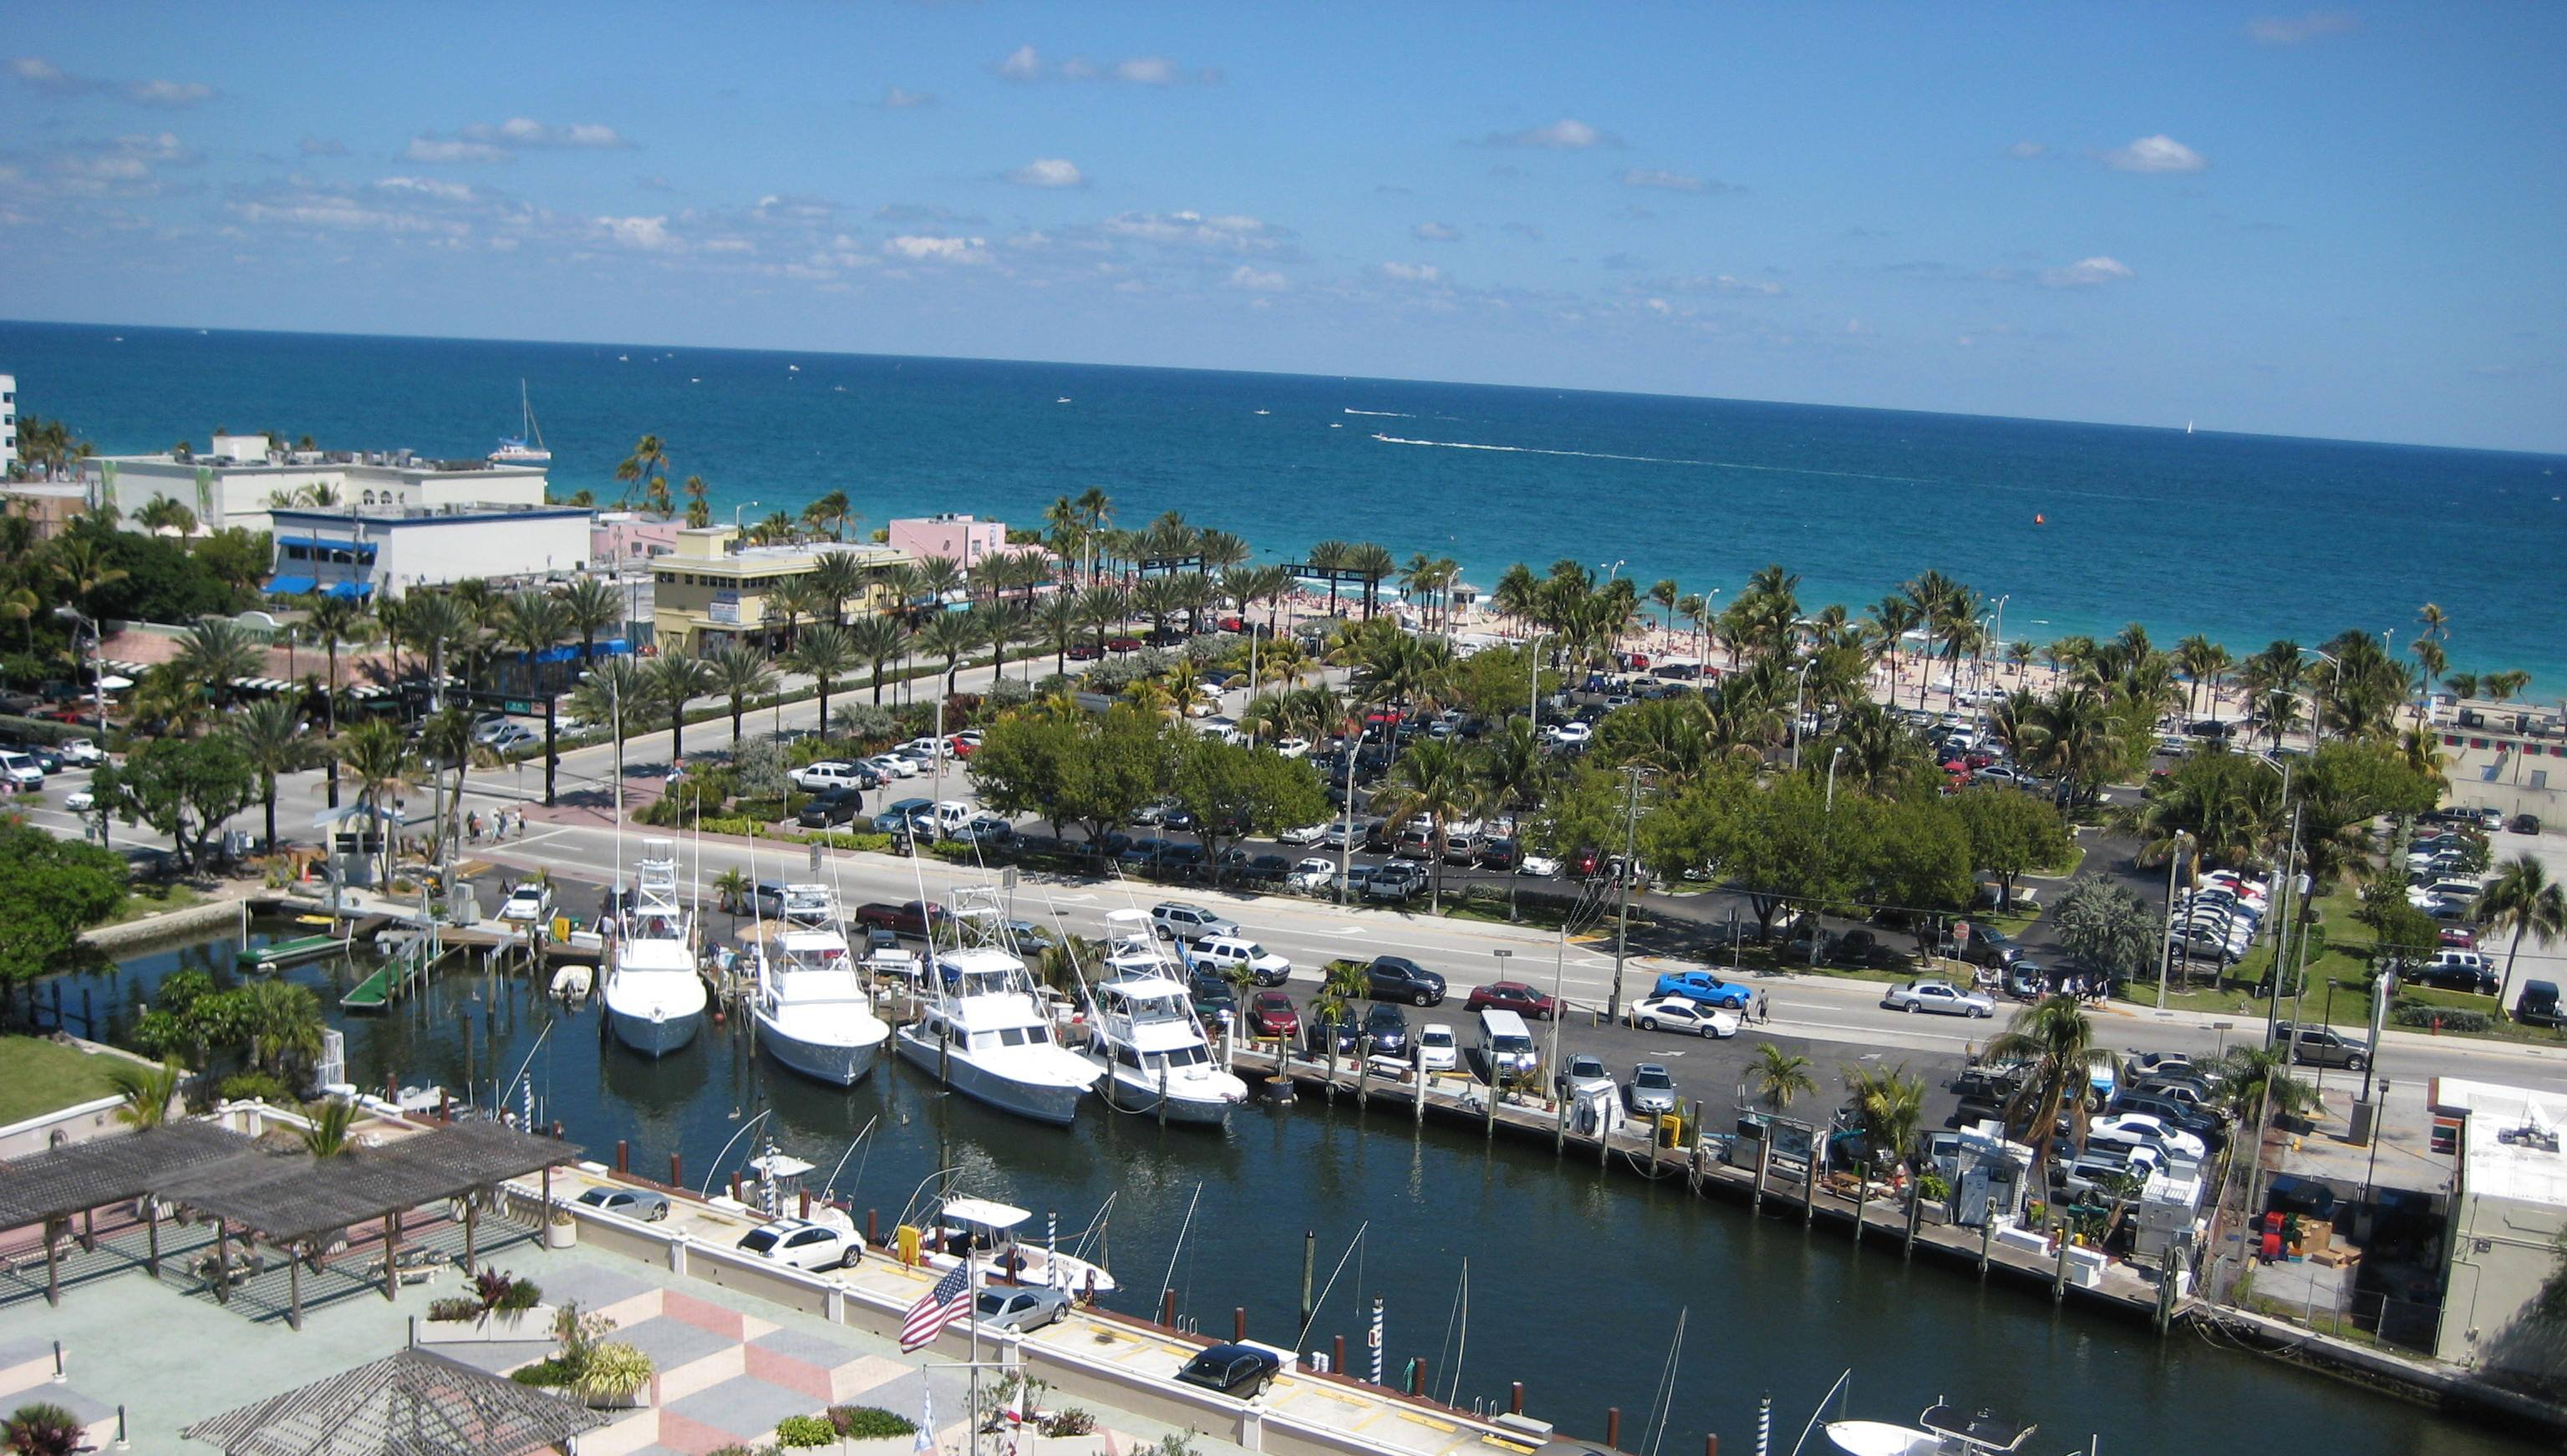 Ft Lauderdale Marina